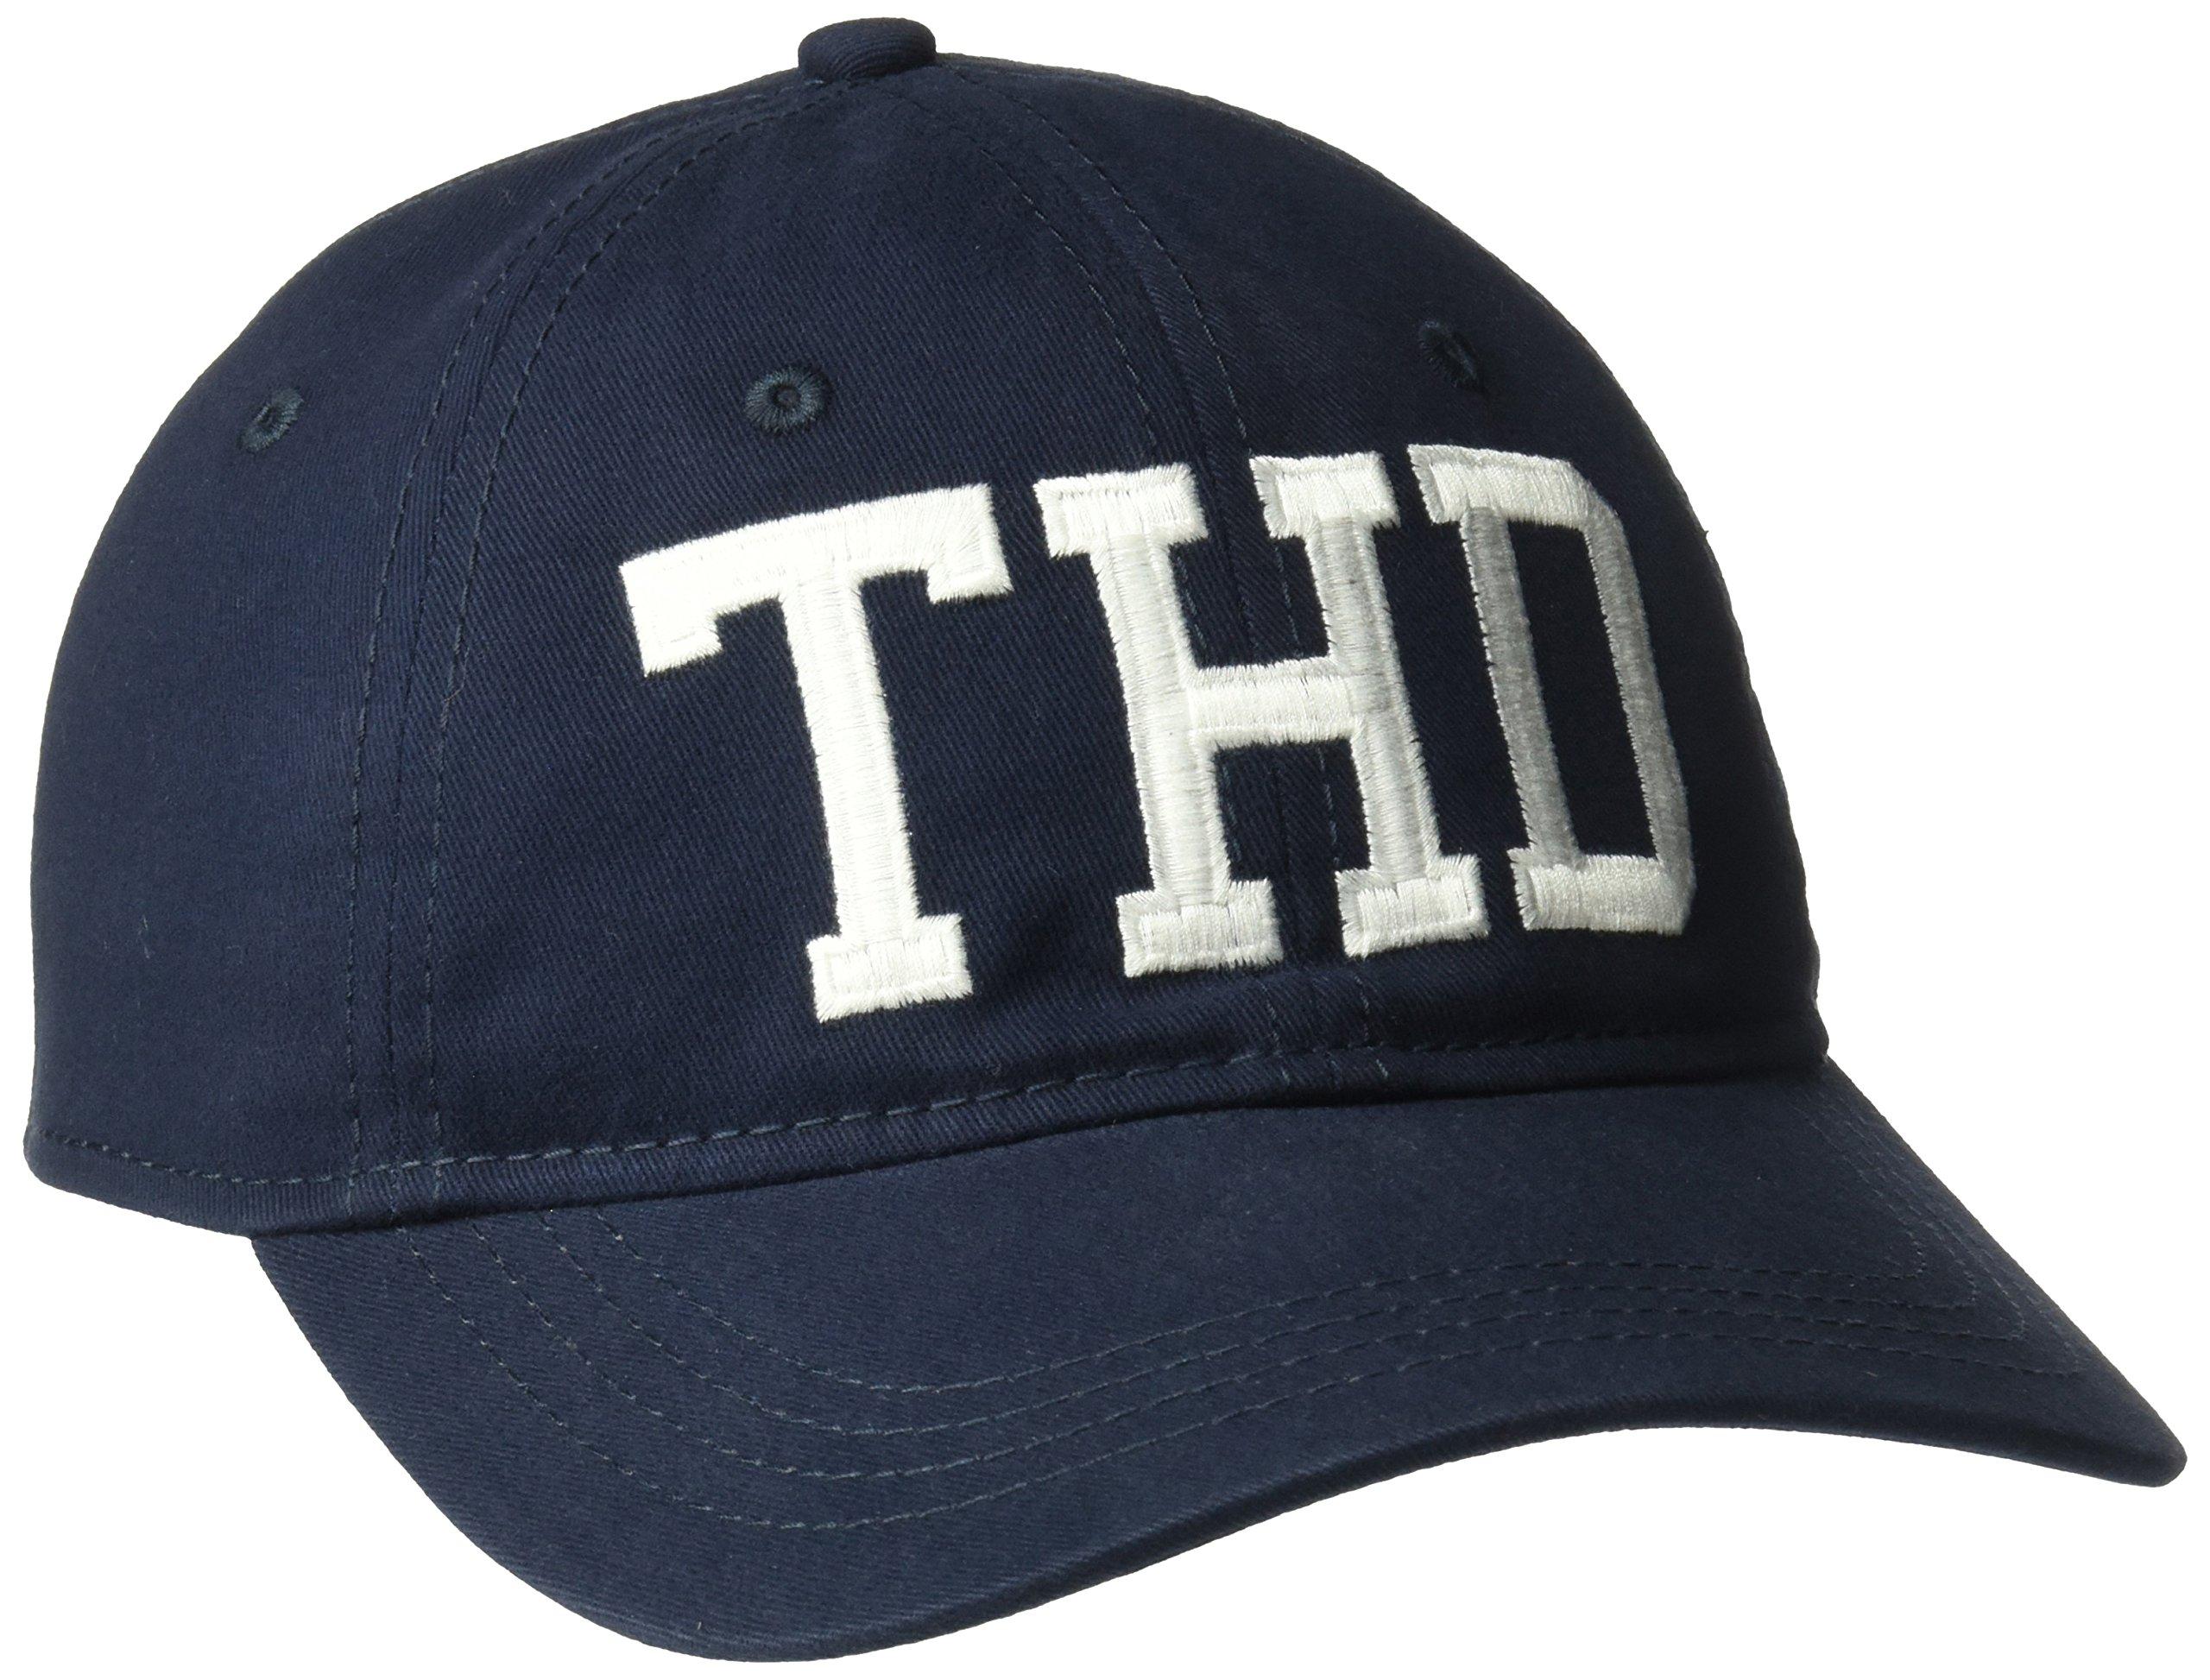 Tommy Hilfiger Men's Sammy Baseball Dad Cap, Navy Blazer, One Size